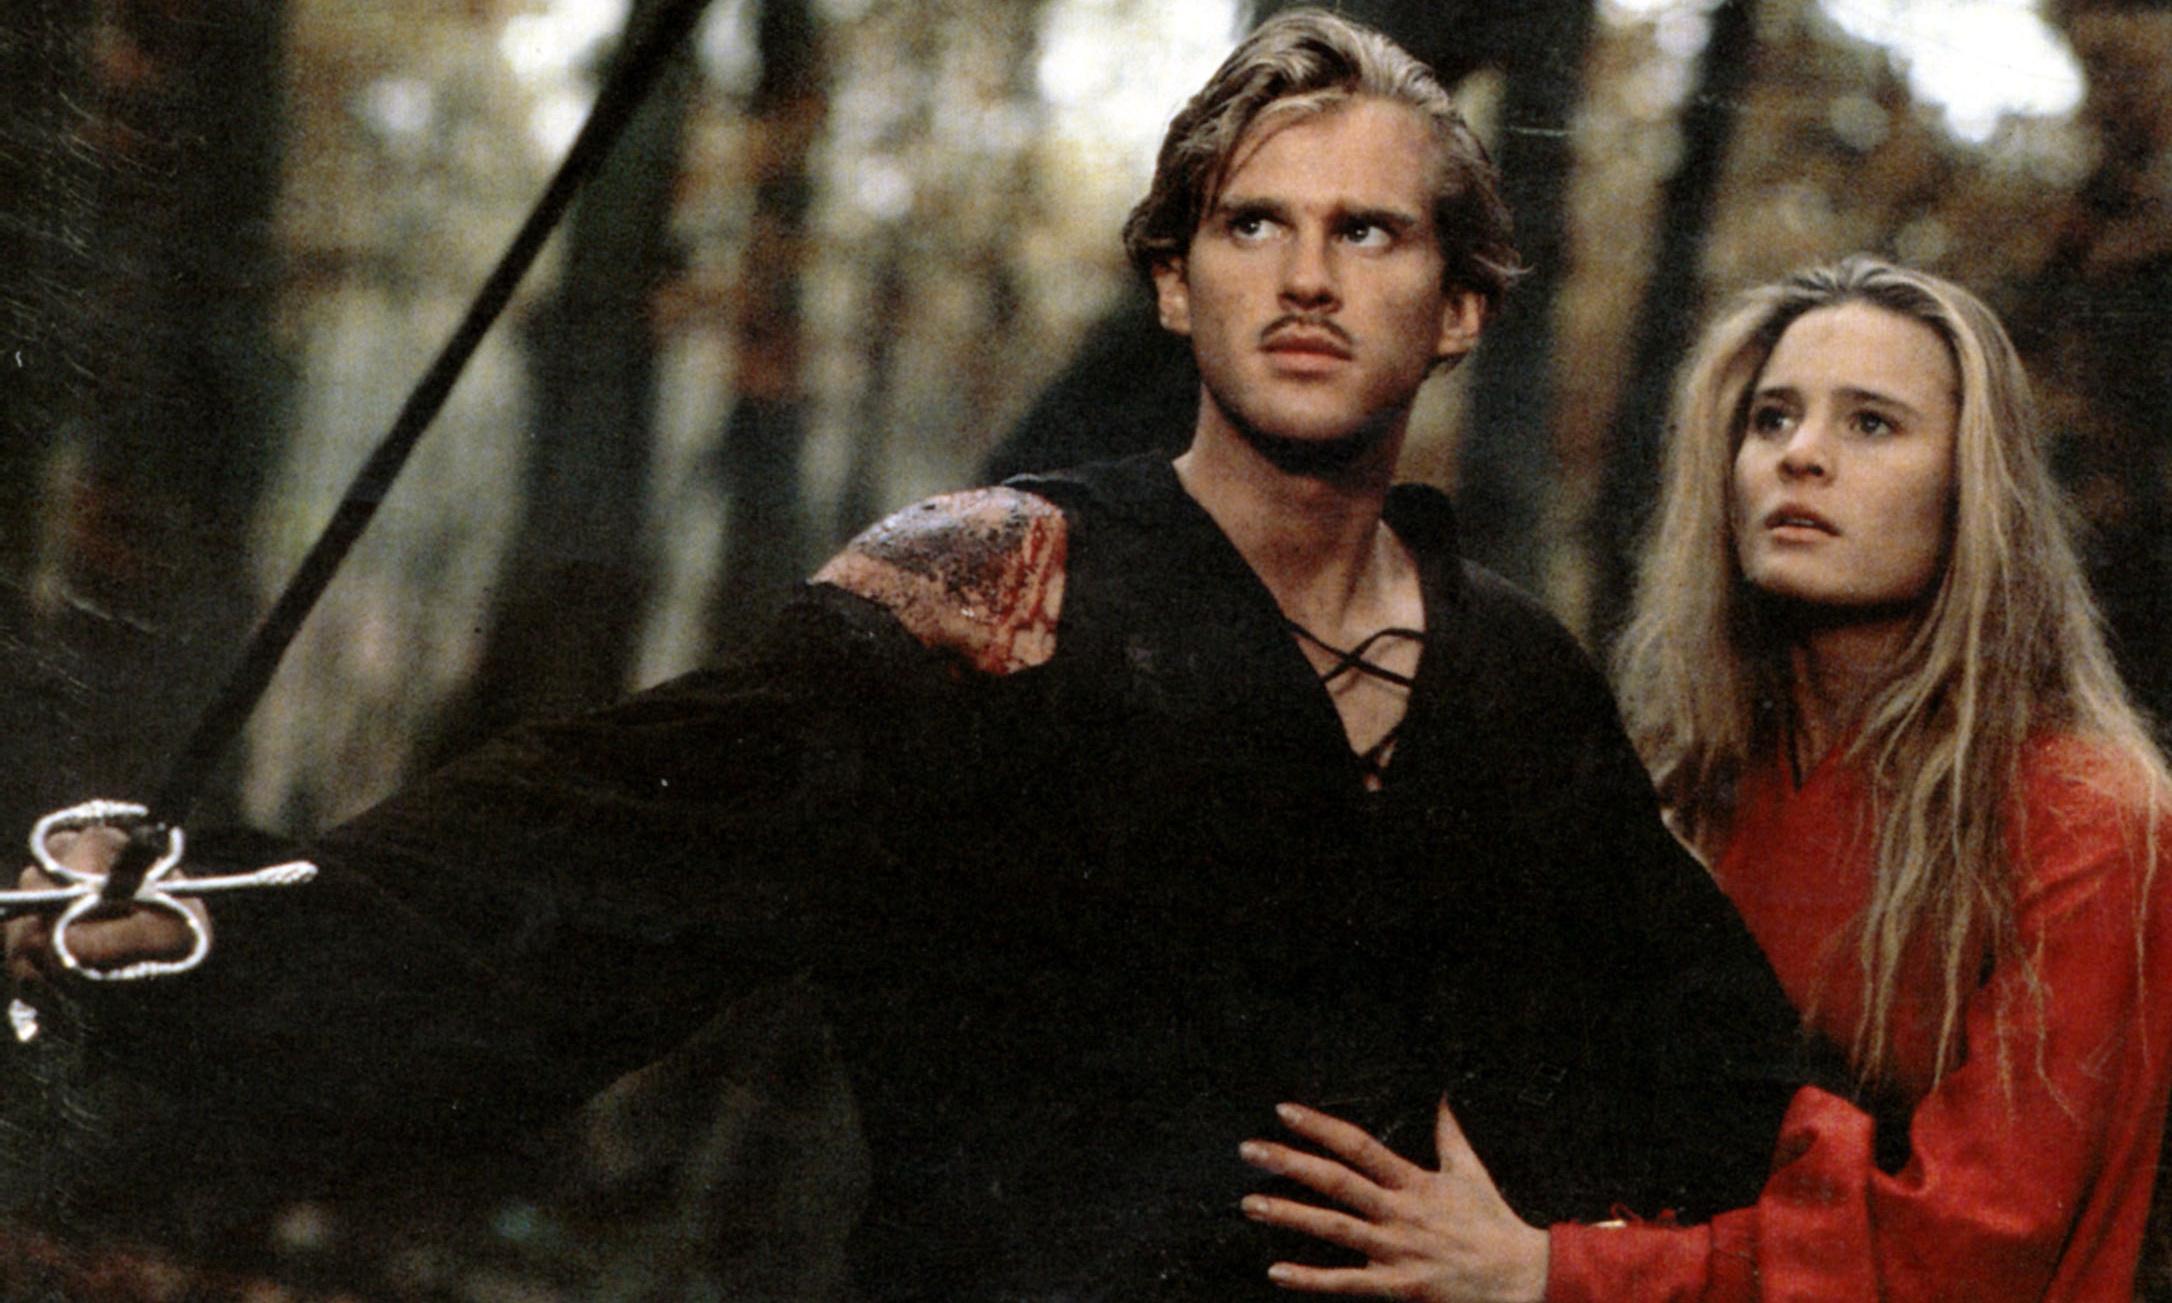 Inconceivable: rumour of The Princess Bride remake sends fans into pit of despair